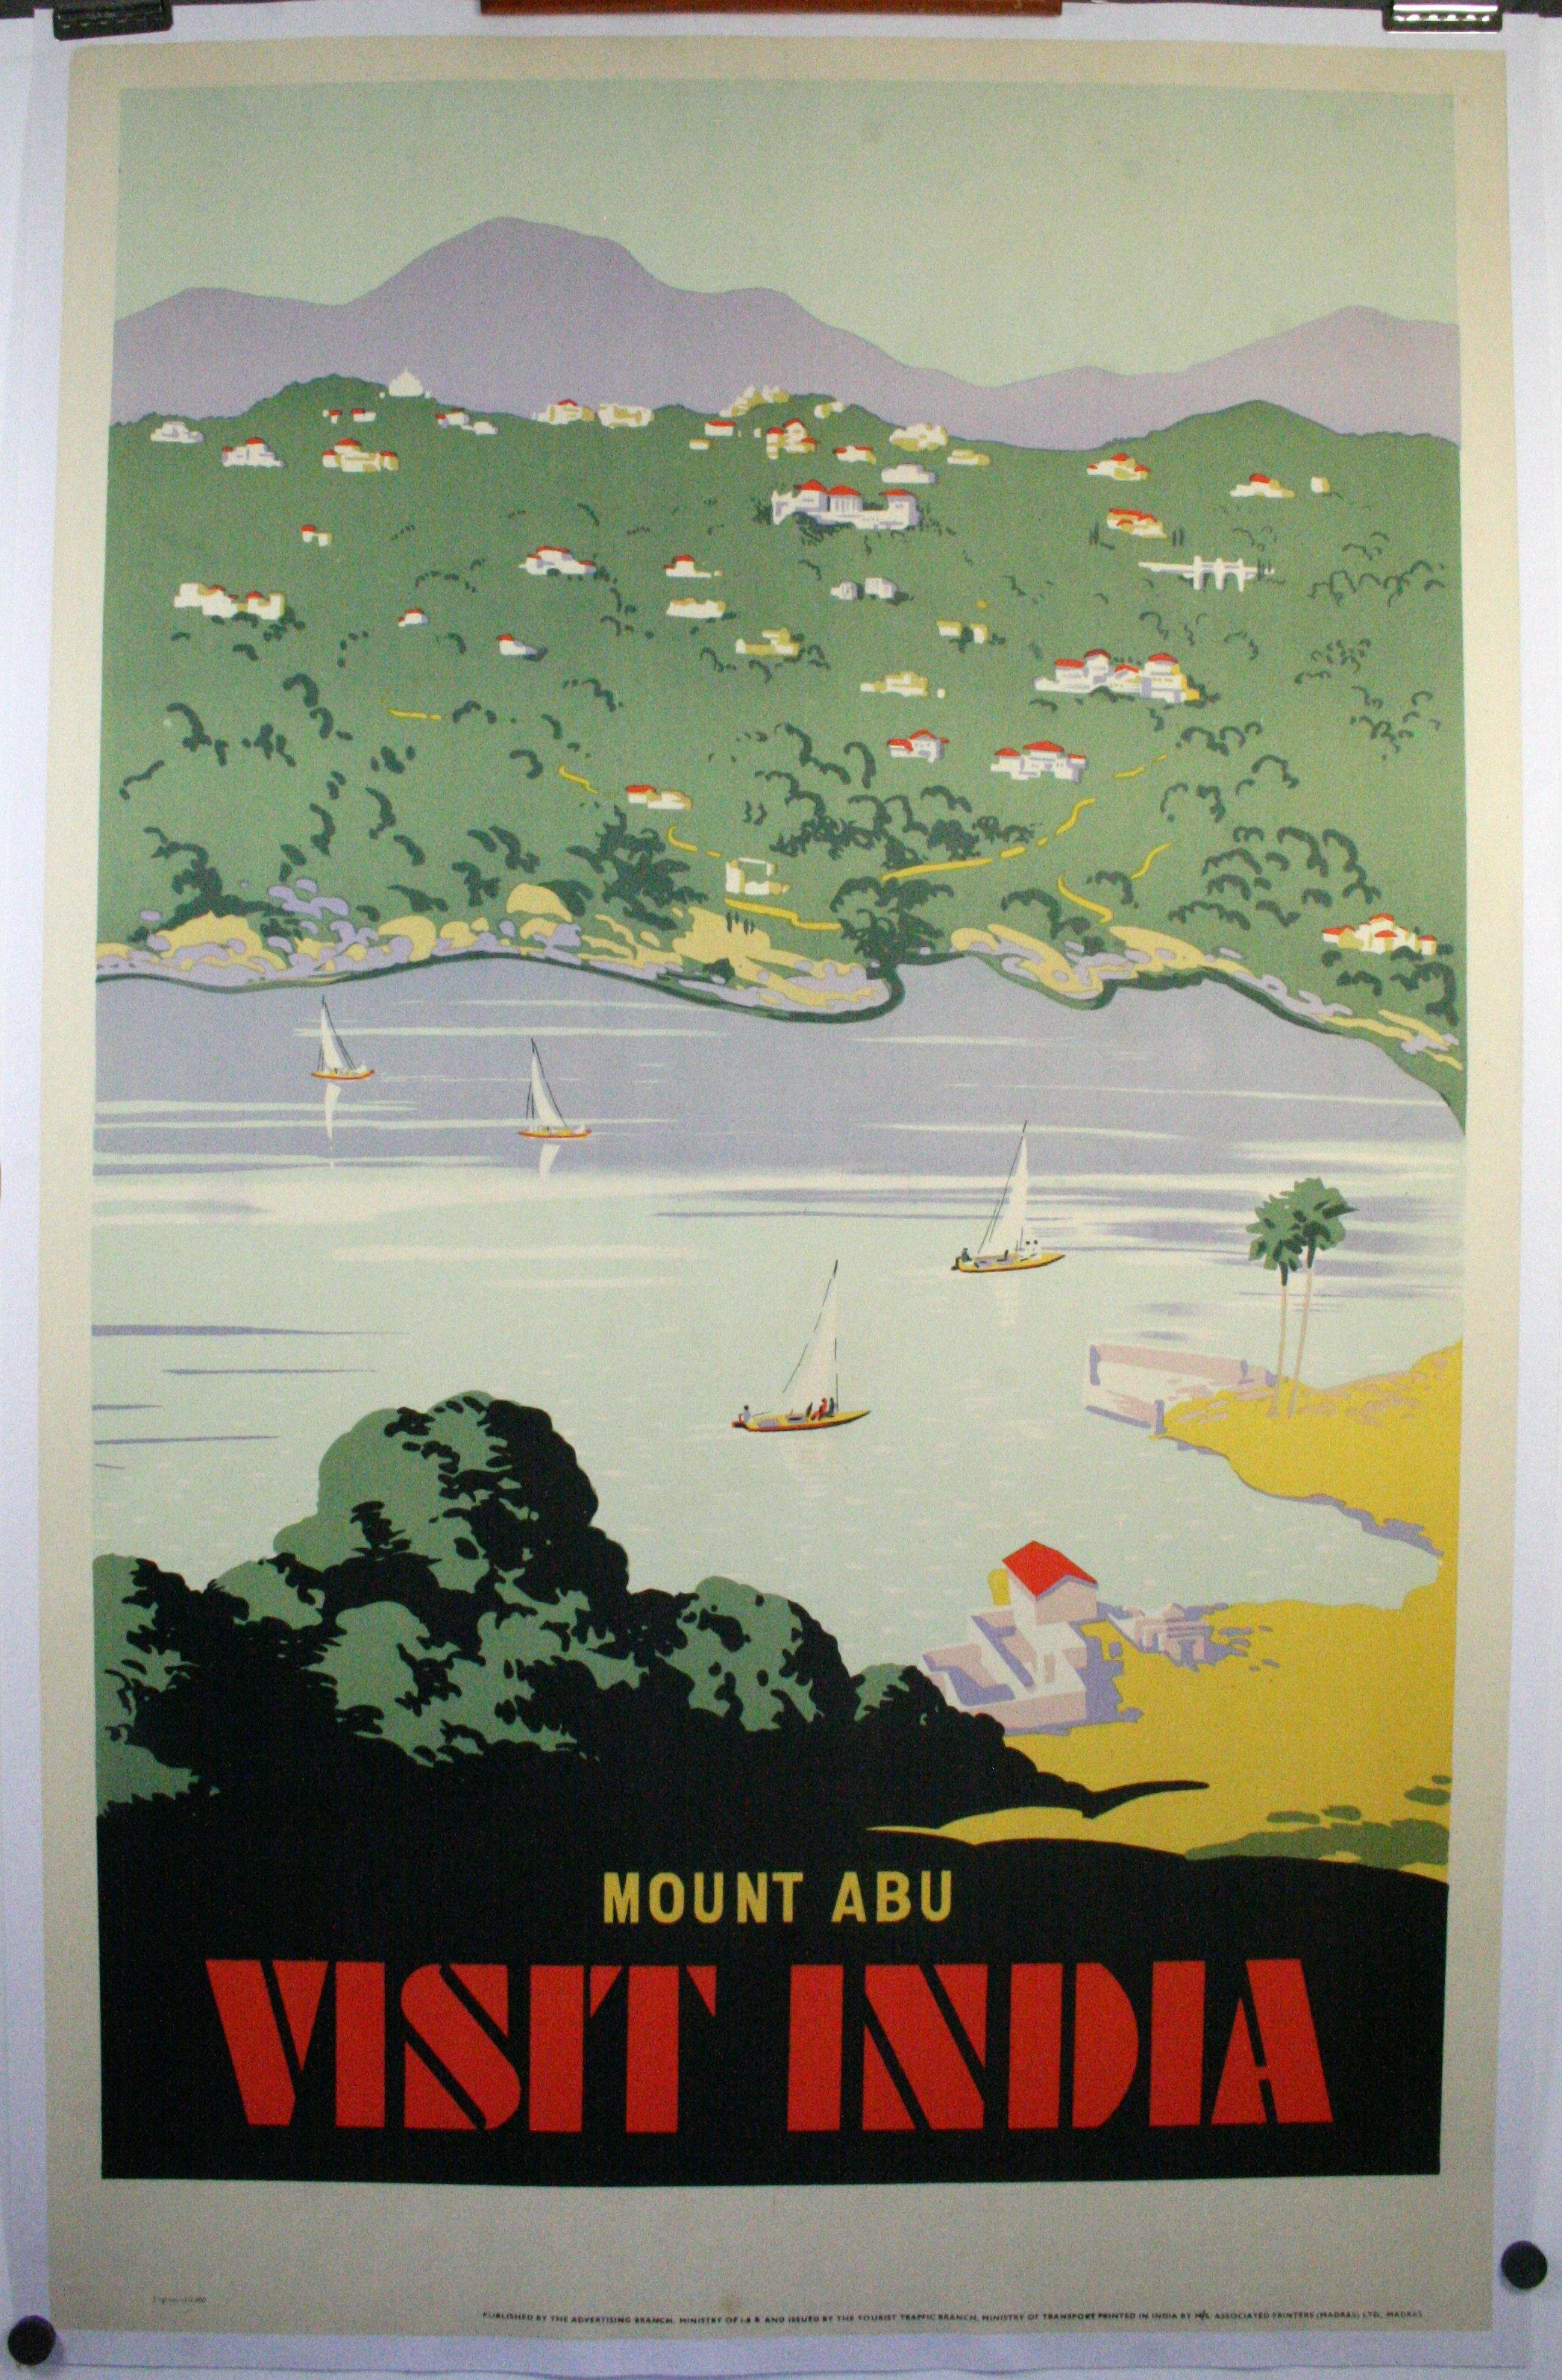 Mount Abu Visit India Original Vintage Travel Poster